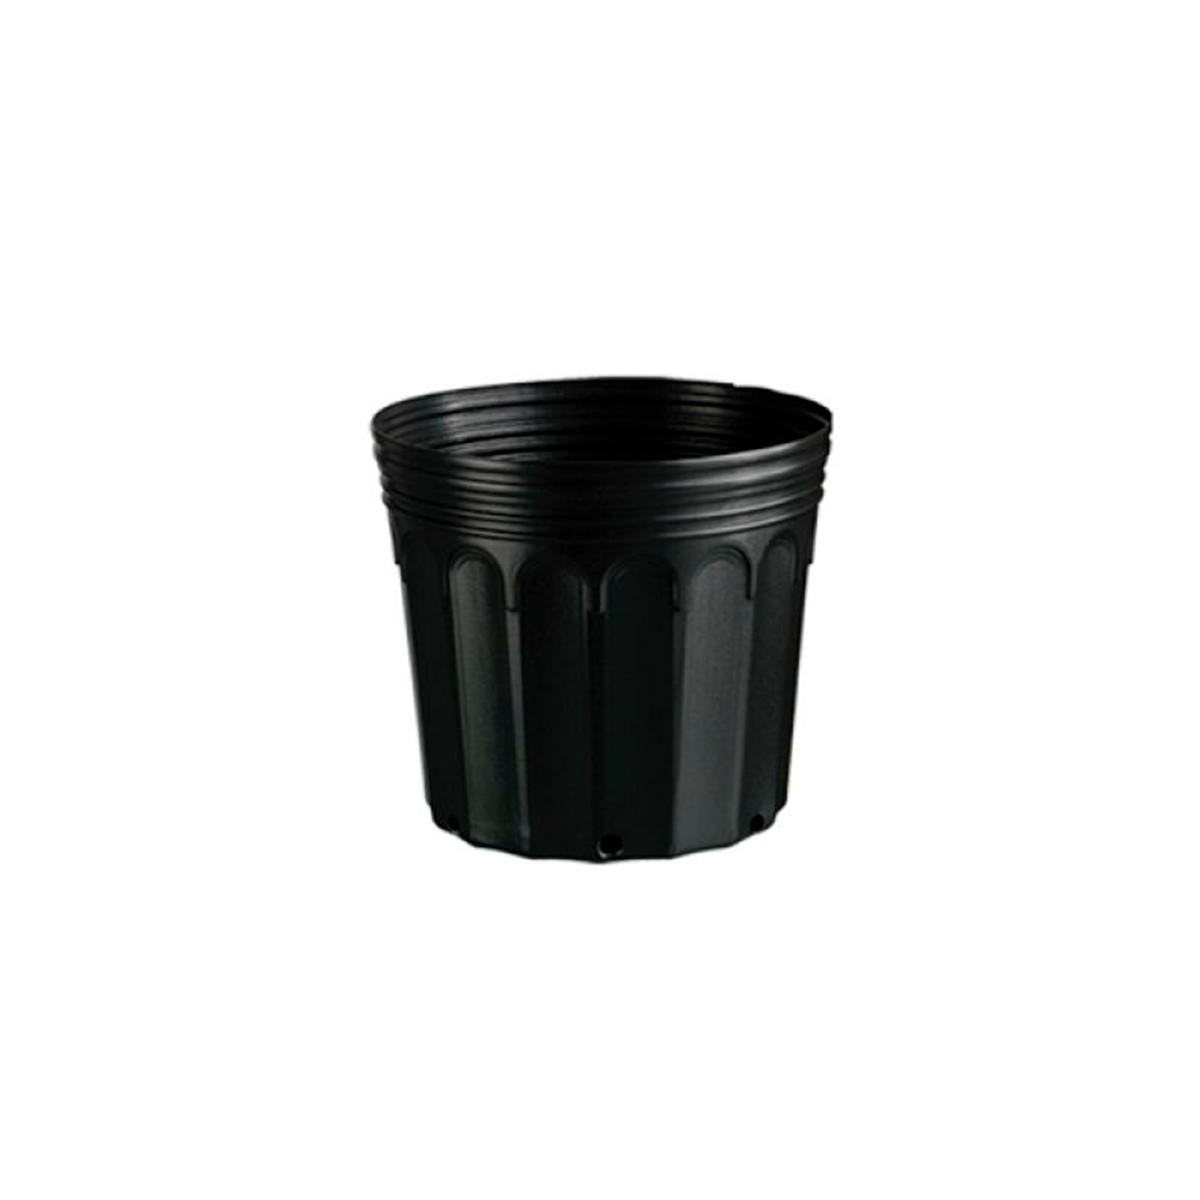 Kit 20 Embalagem Vaso para Mudas Plástico 3,6L